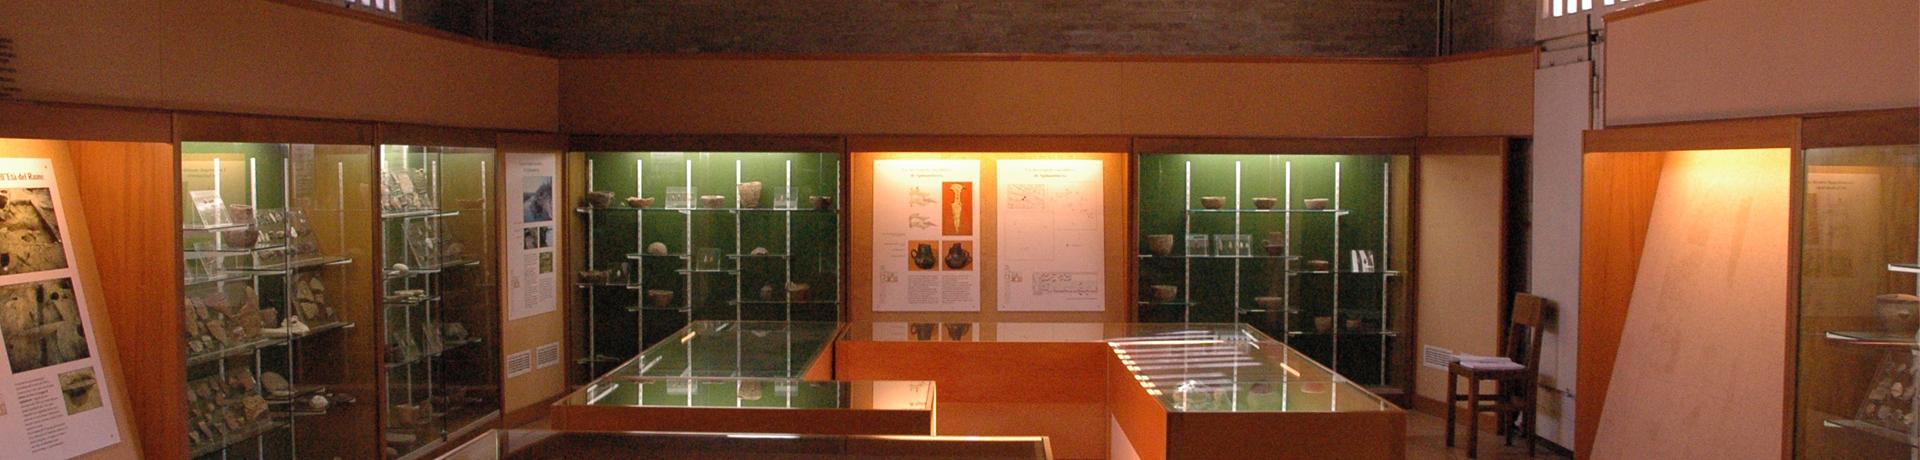 Il museo si racconta Archeo40 – i tesori di spilamberto in 40 anni di scavi archeologici